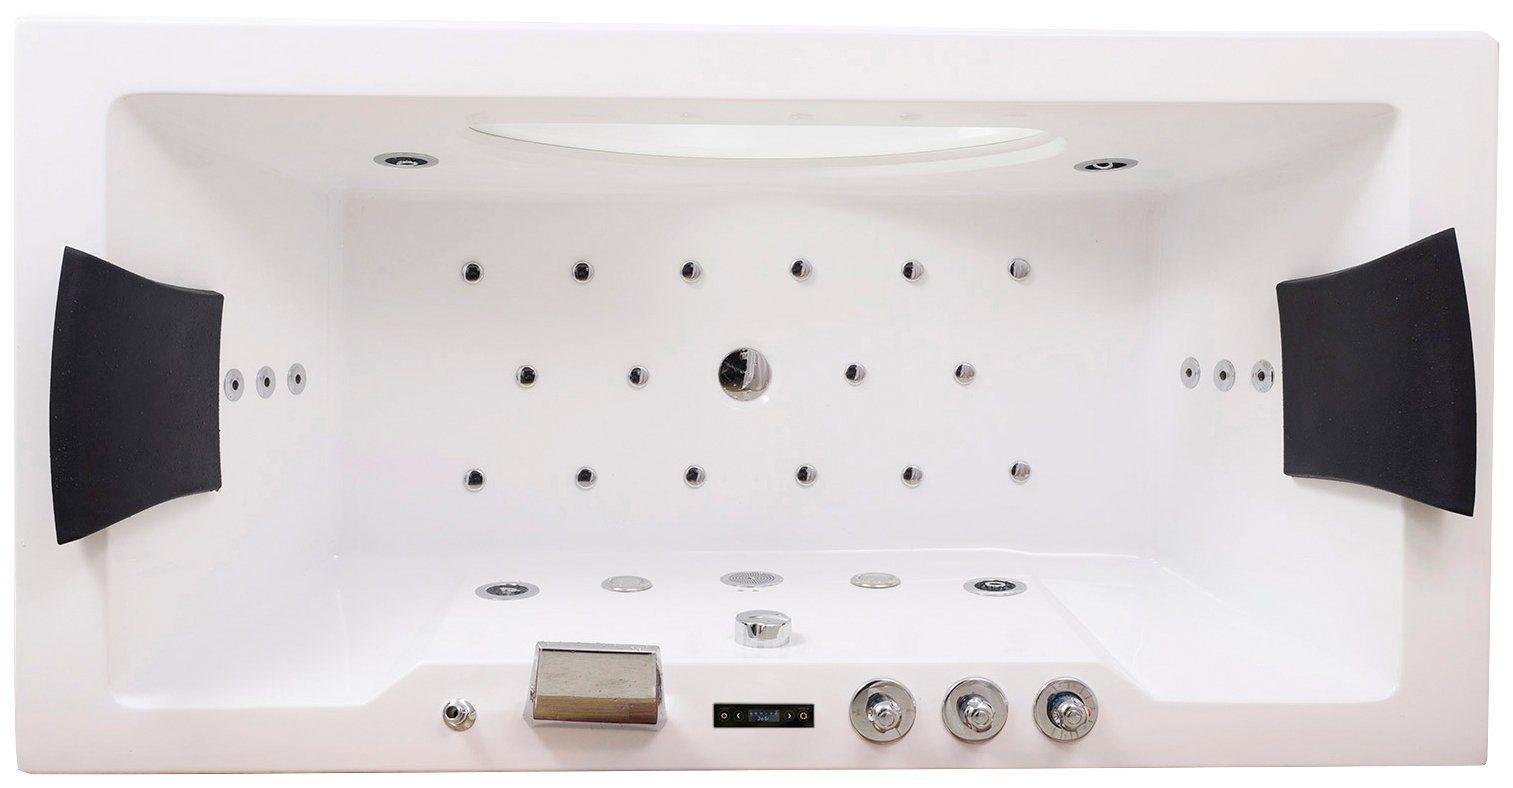 Whirlpool Bad Informatie : Complete set whirlpoolbad white m« bxdxh in cm met